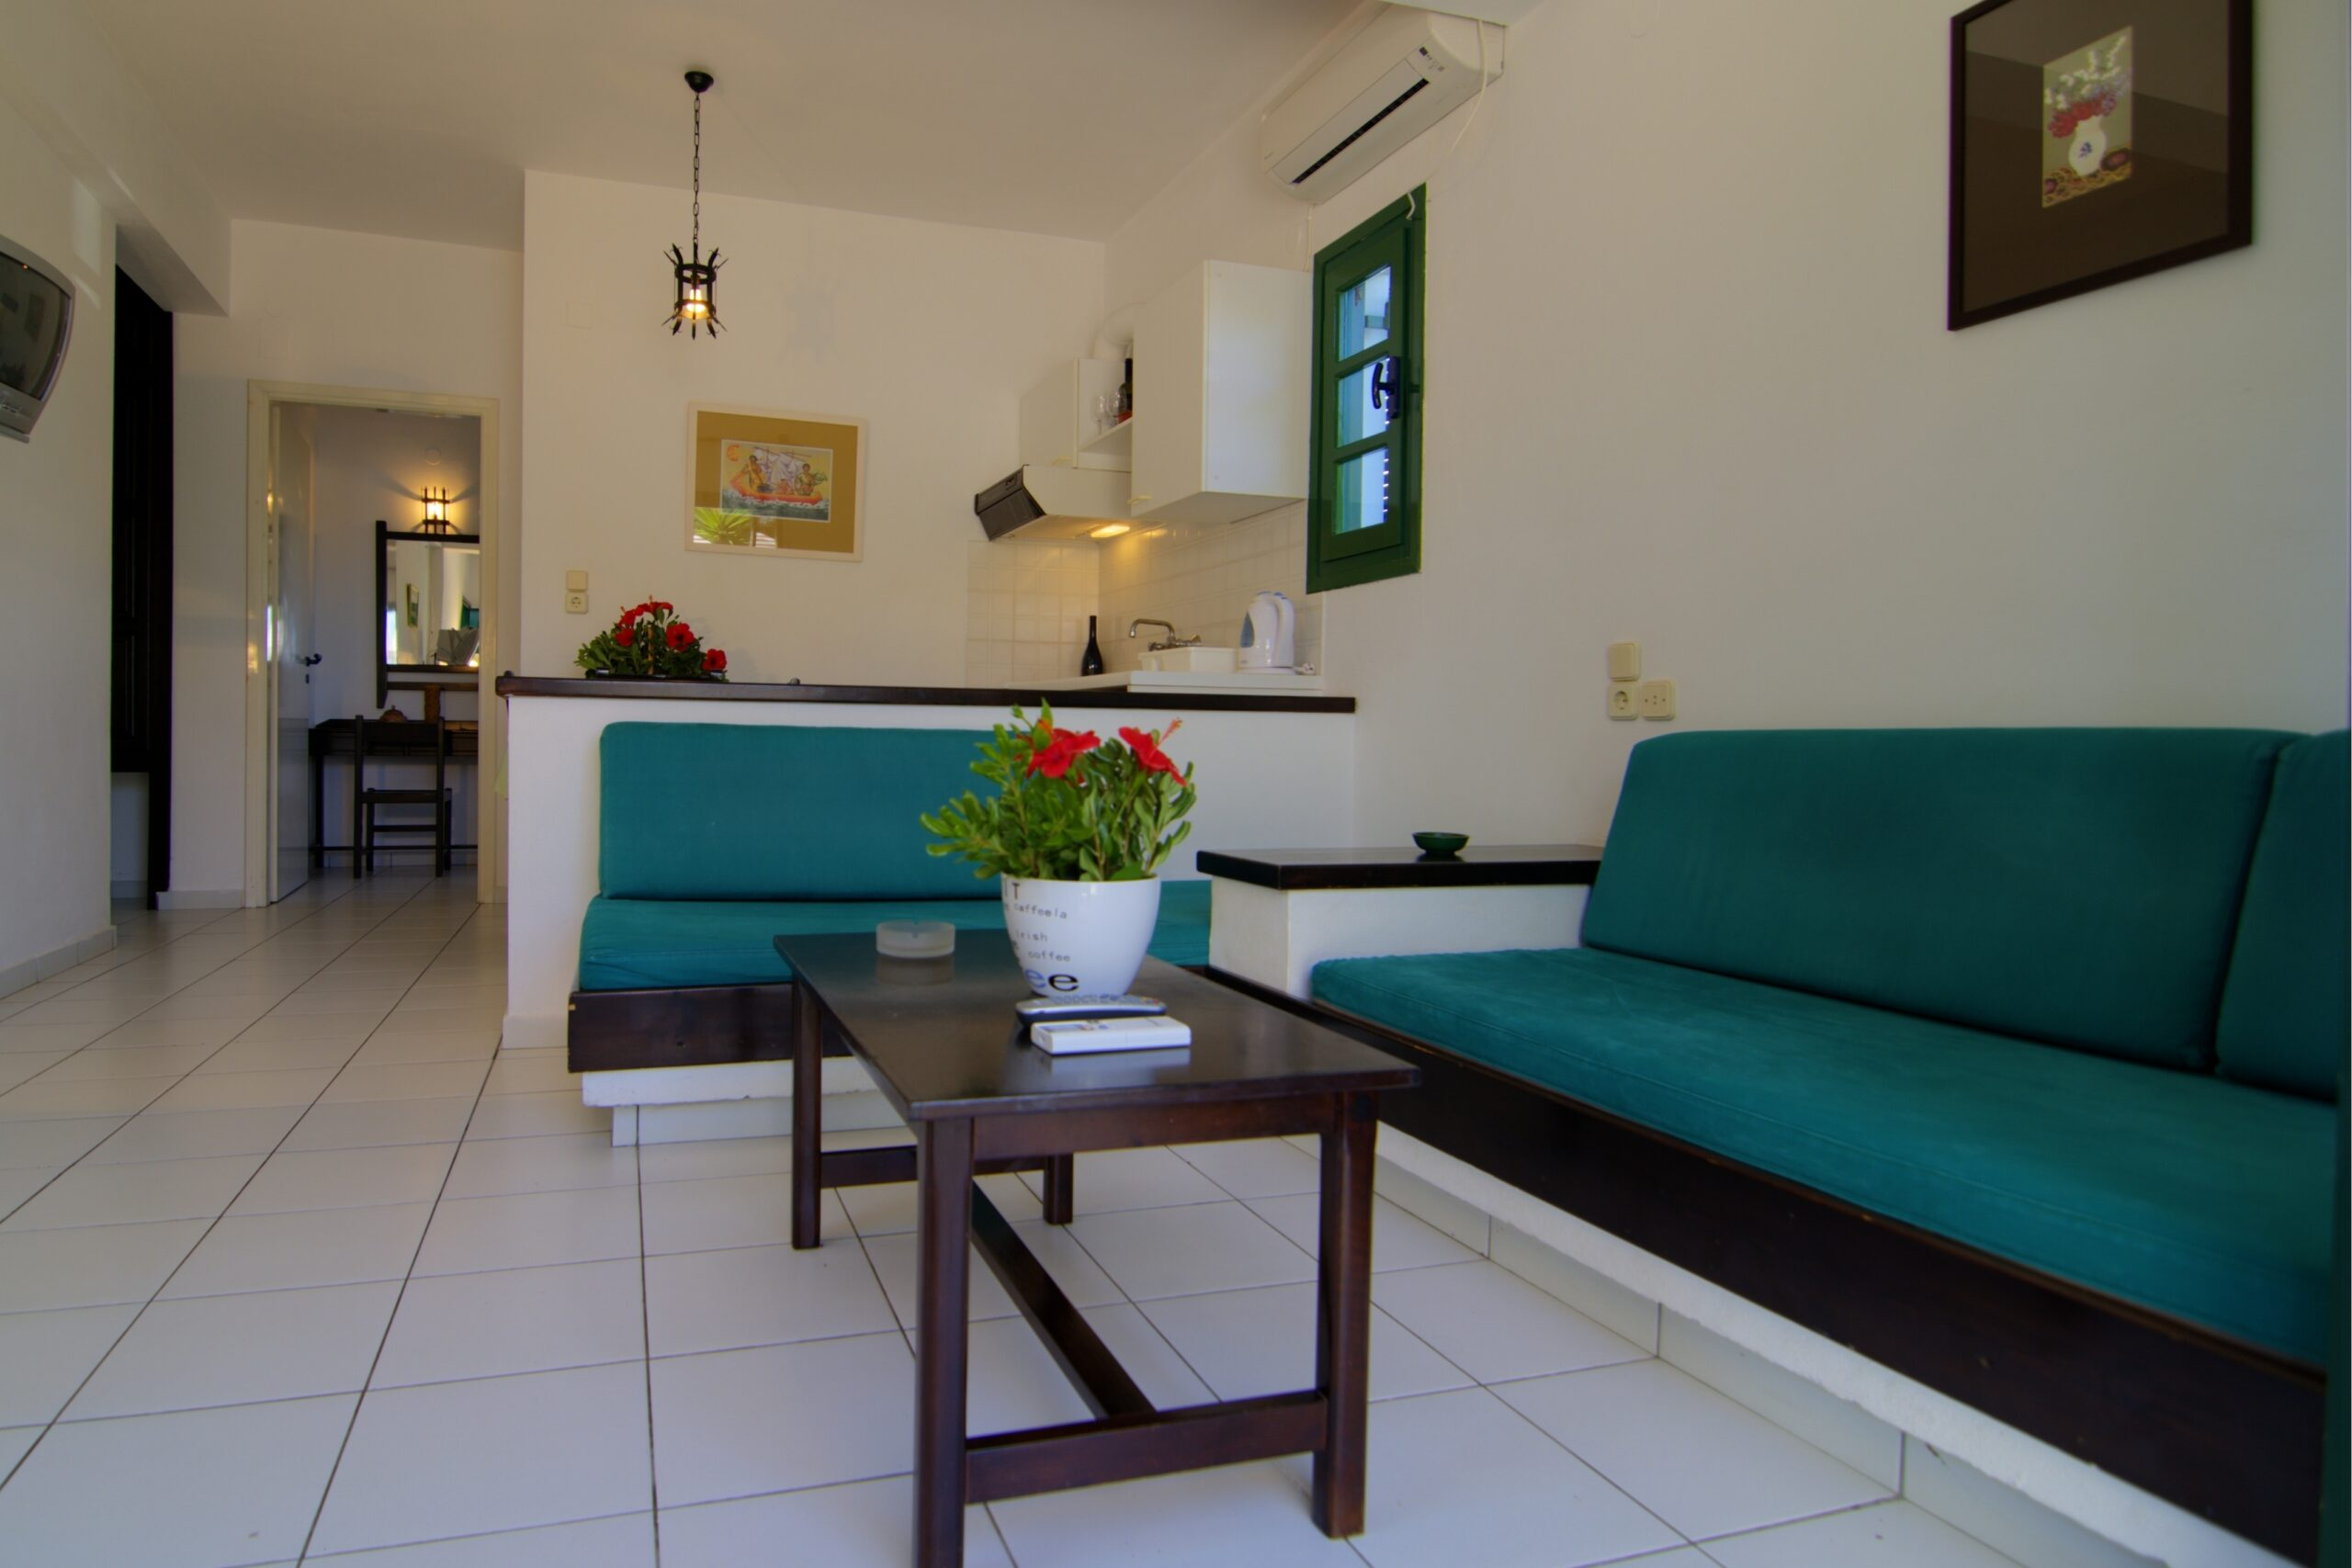 SIRIUS APTS - GREEN LIVING ROOM